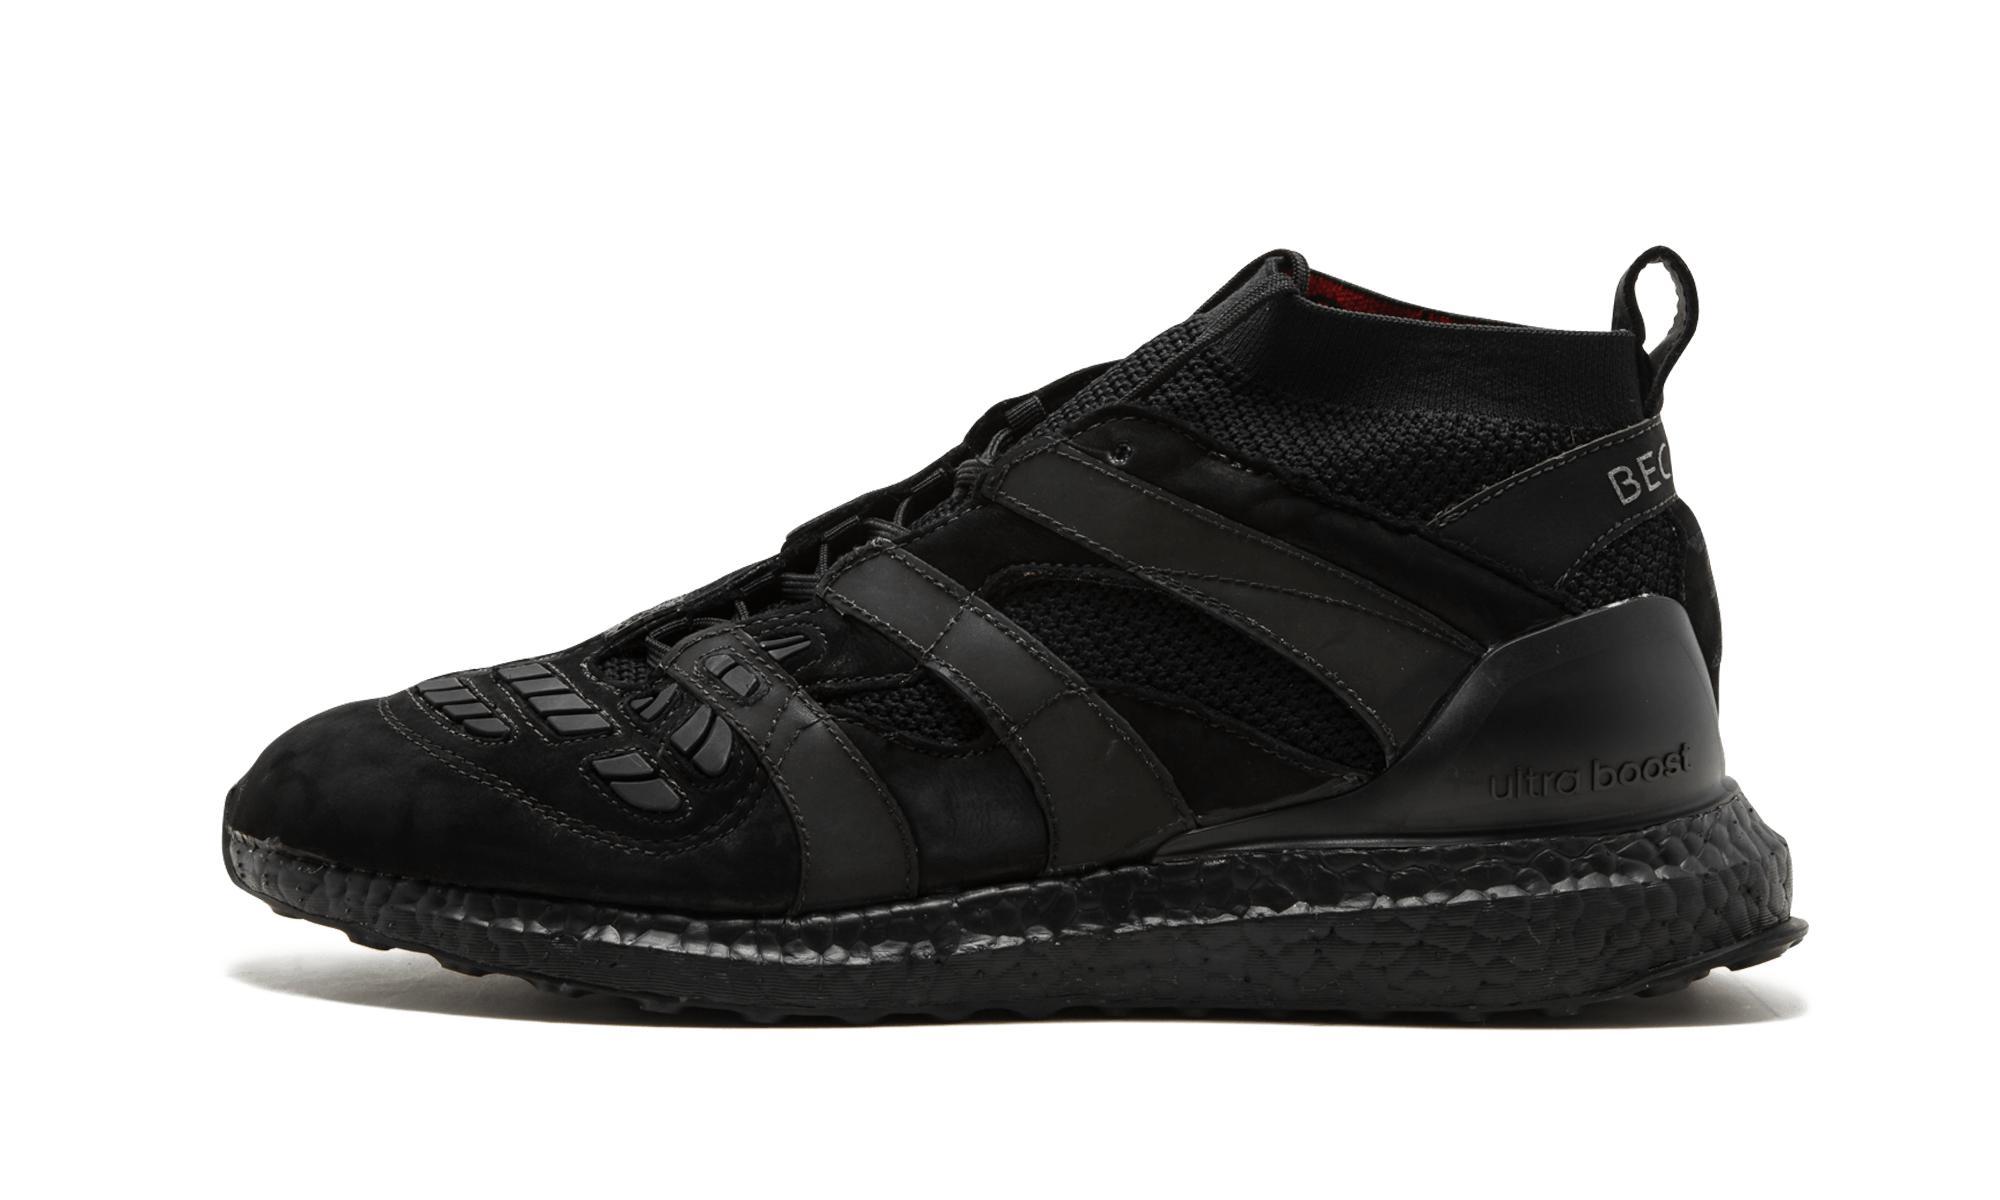 size 40 fc805 c9e09 adidas. Mens Black Db Accelerator Ub